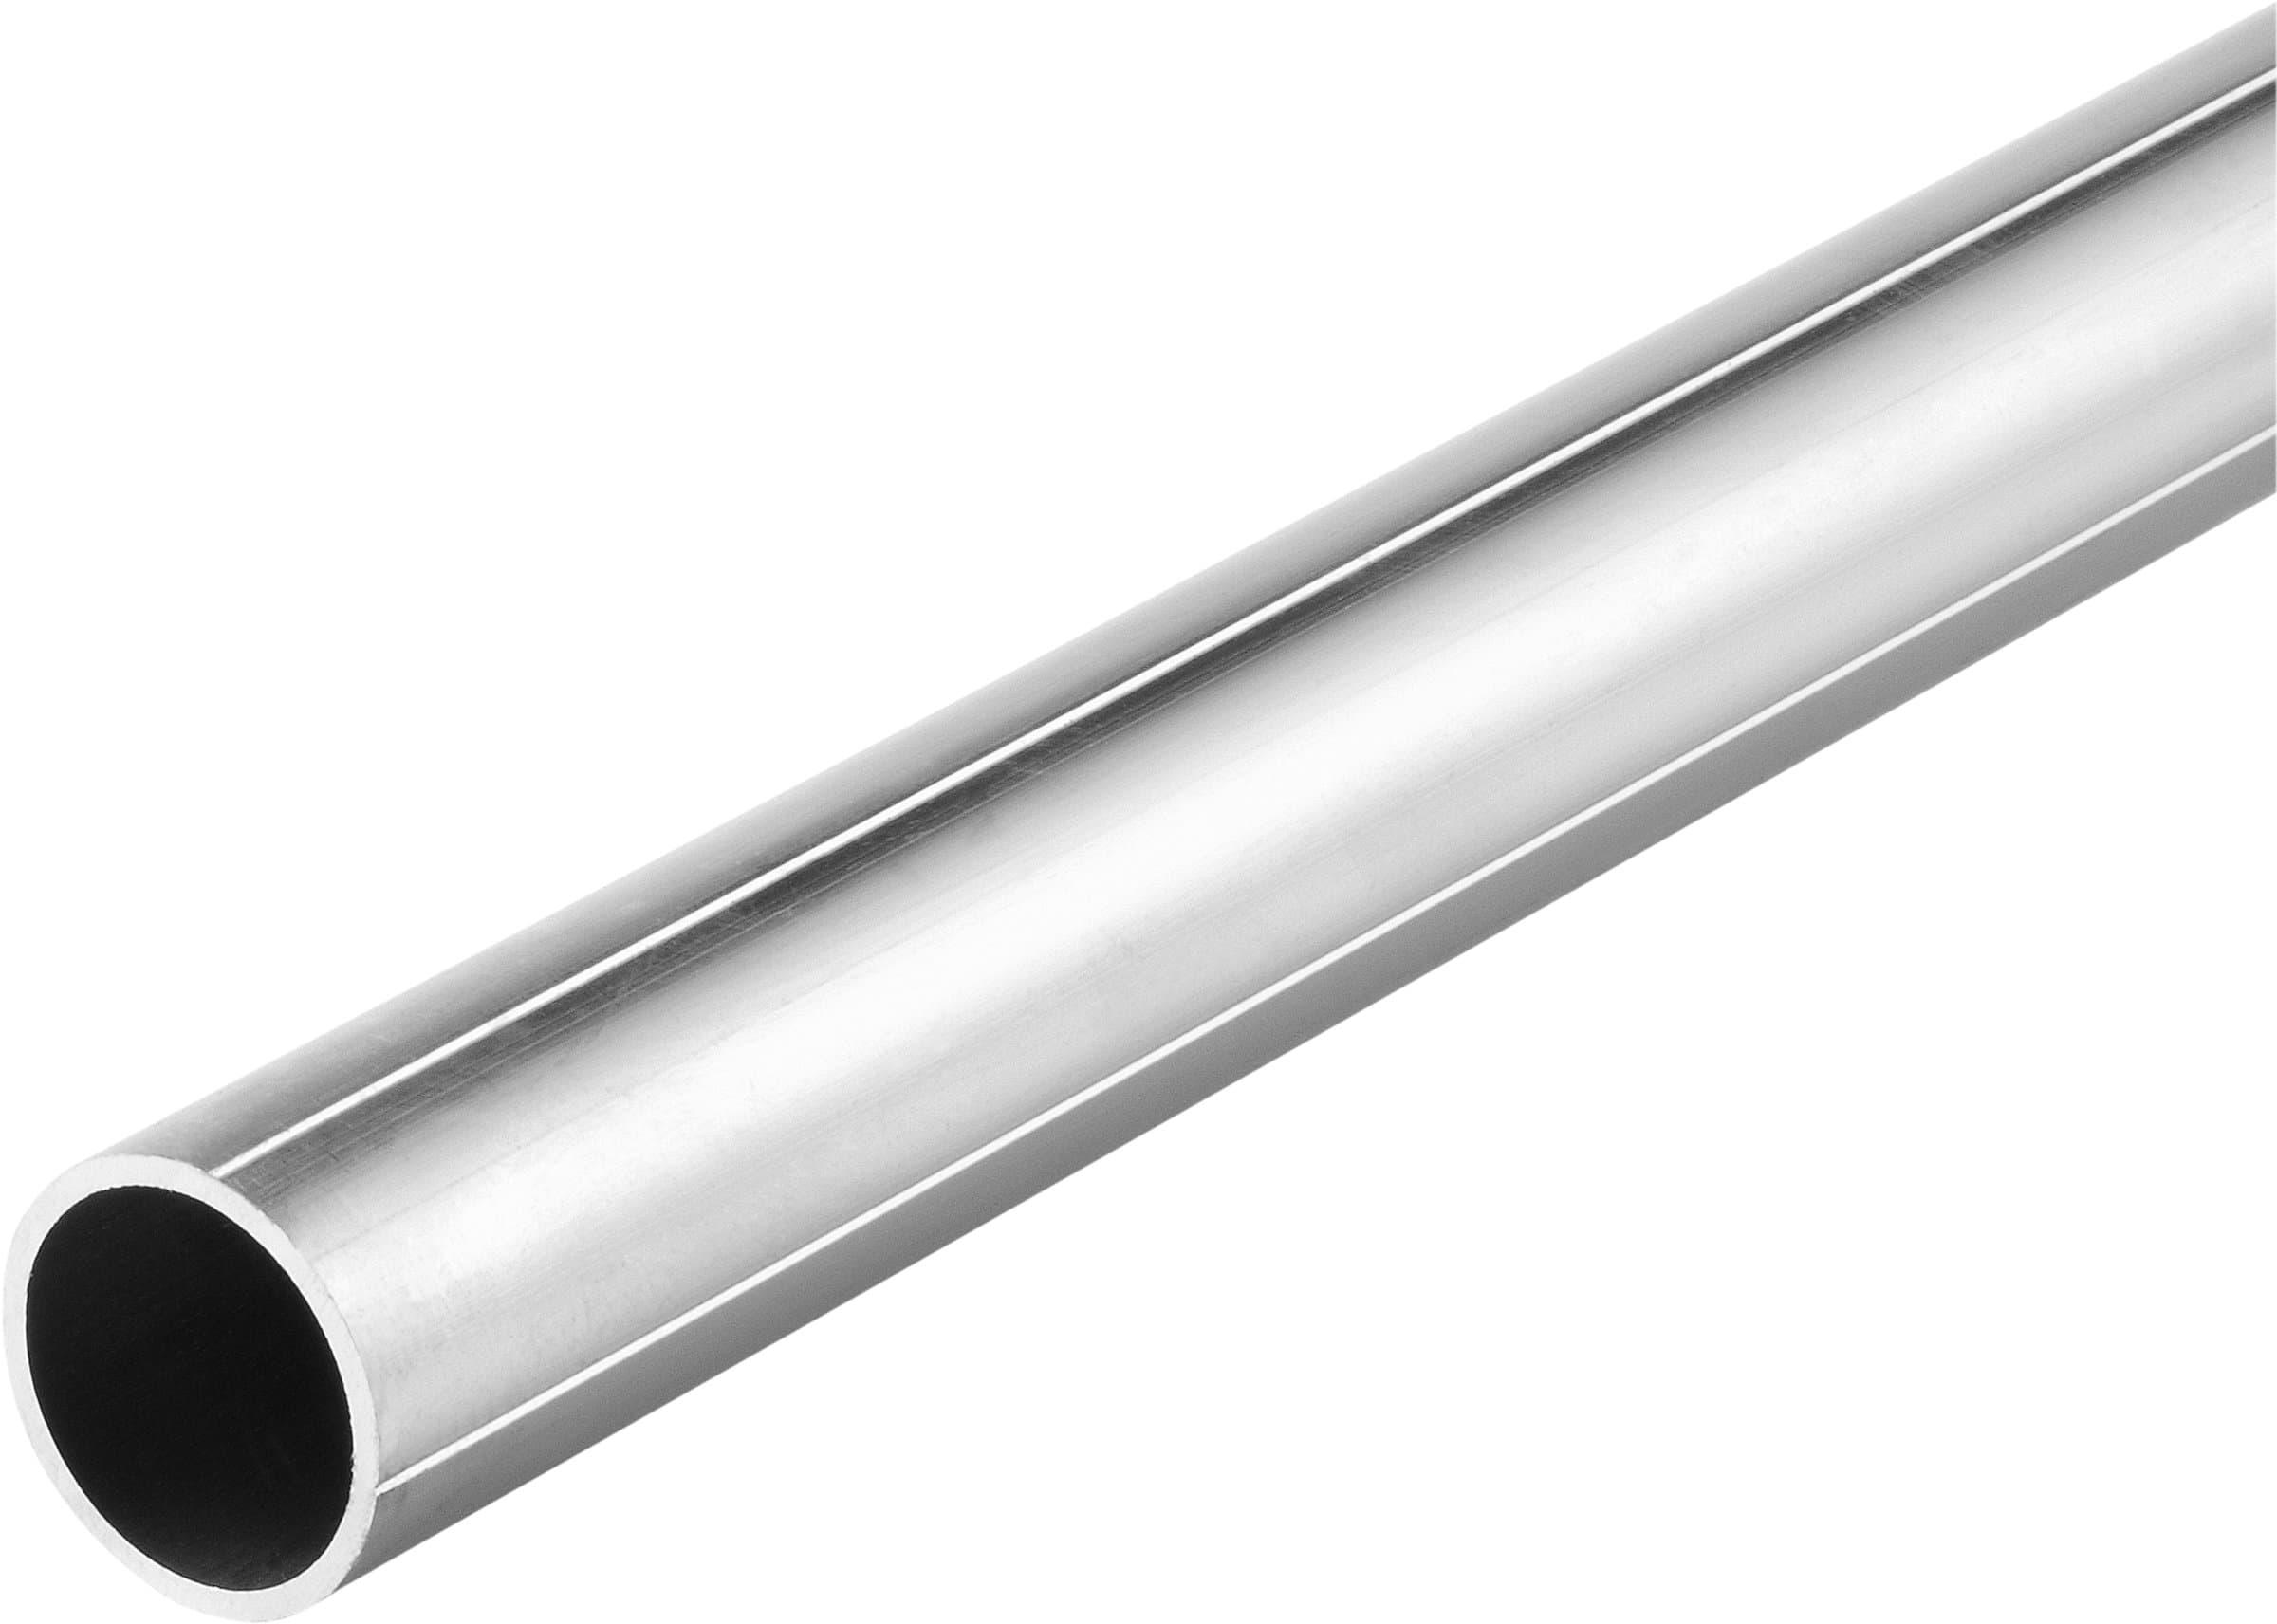 alfer Rundrohr 1.5 x 23.5 mm blank 1 m